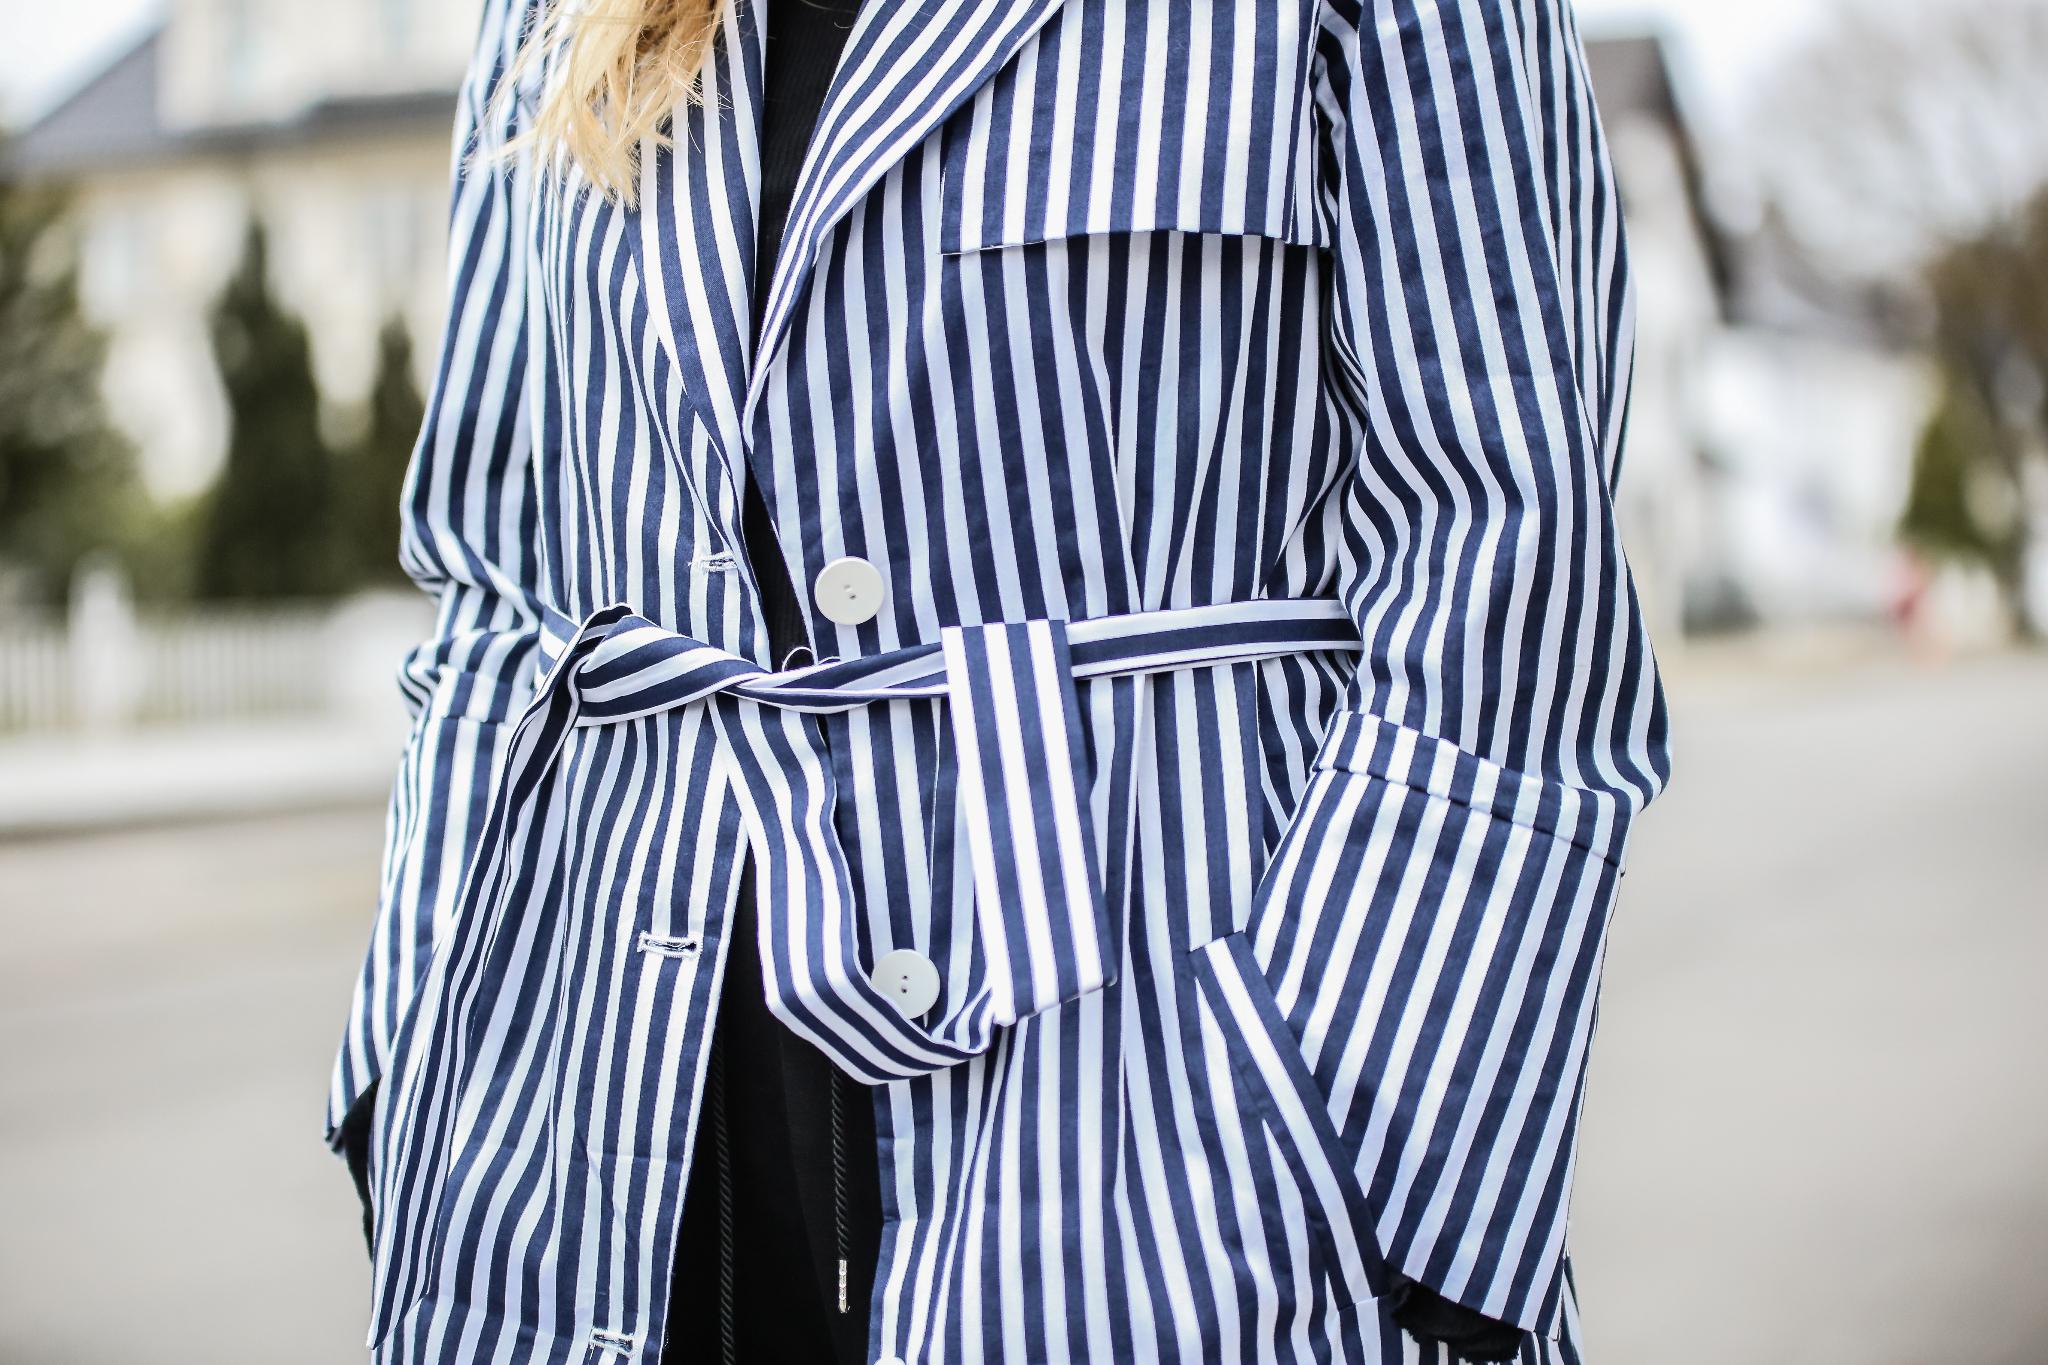 MOD-by-Monique-Fashion-Looks-Striped-Coat-Big-Volants-22